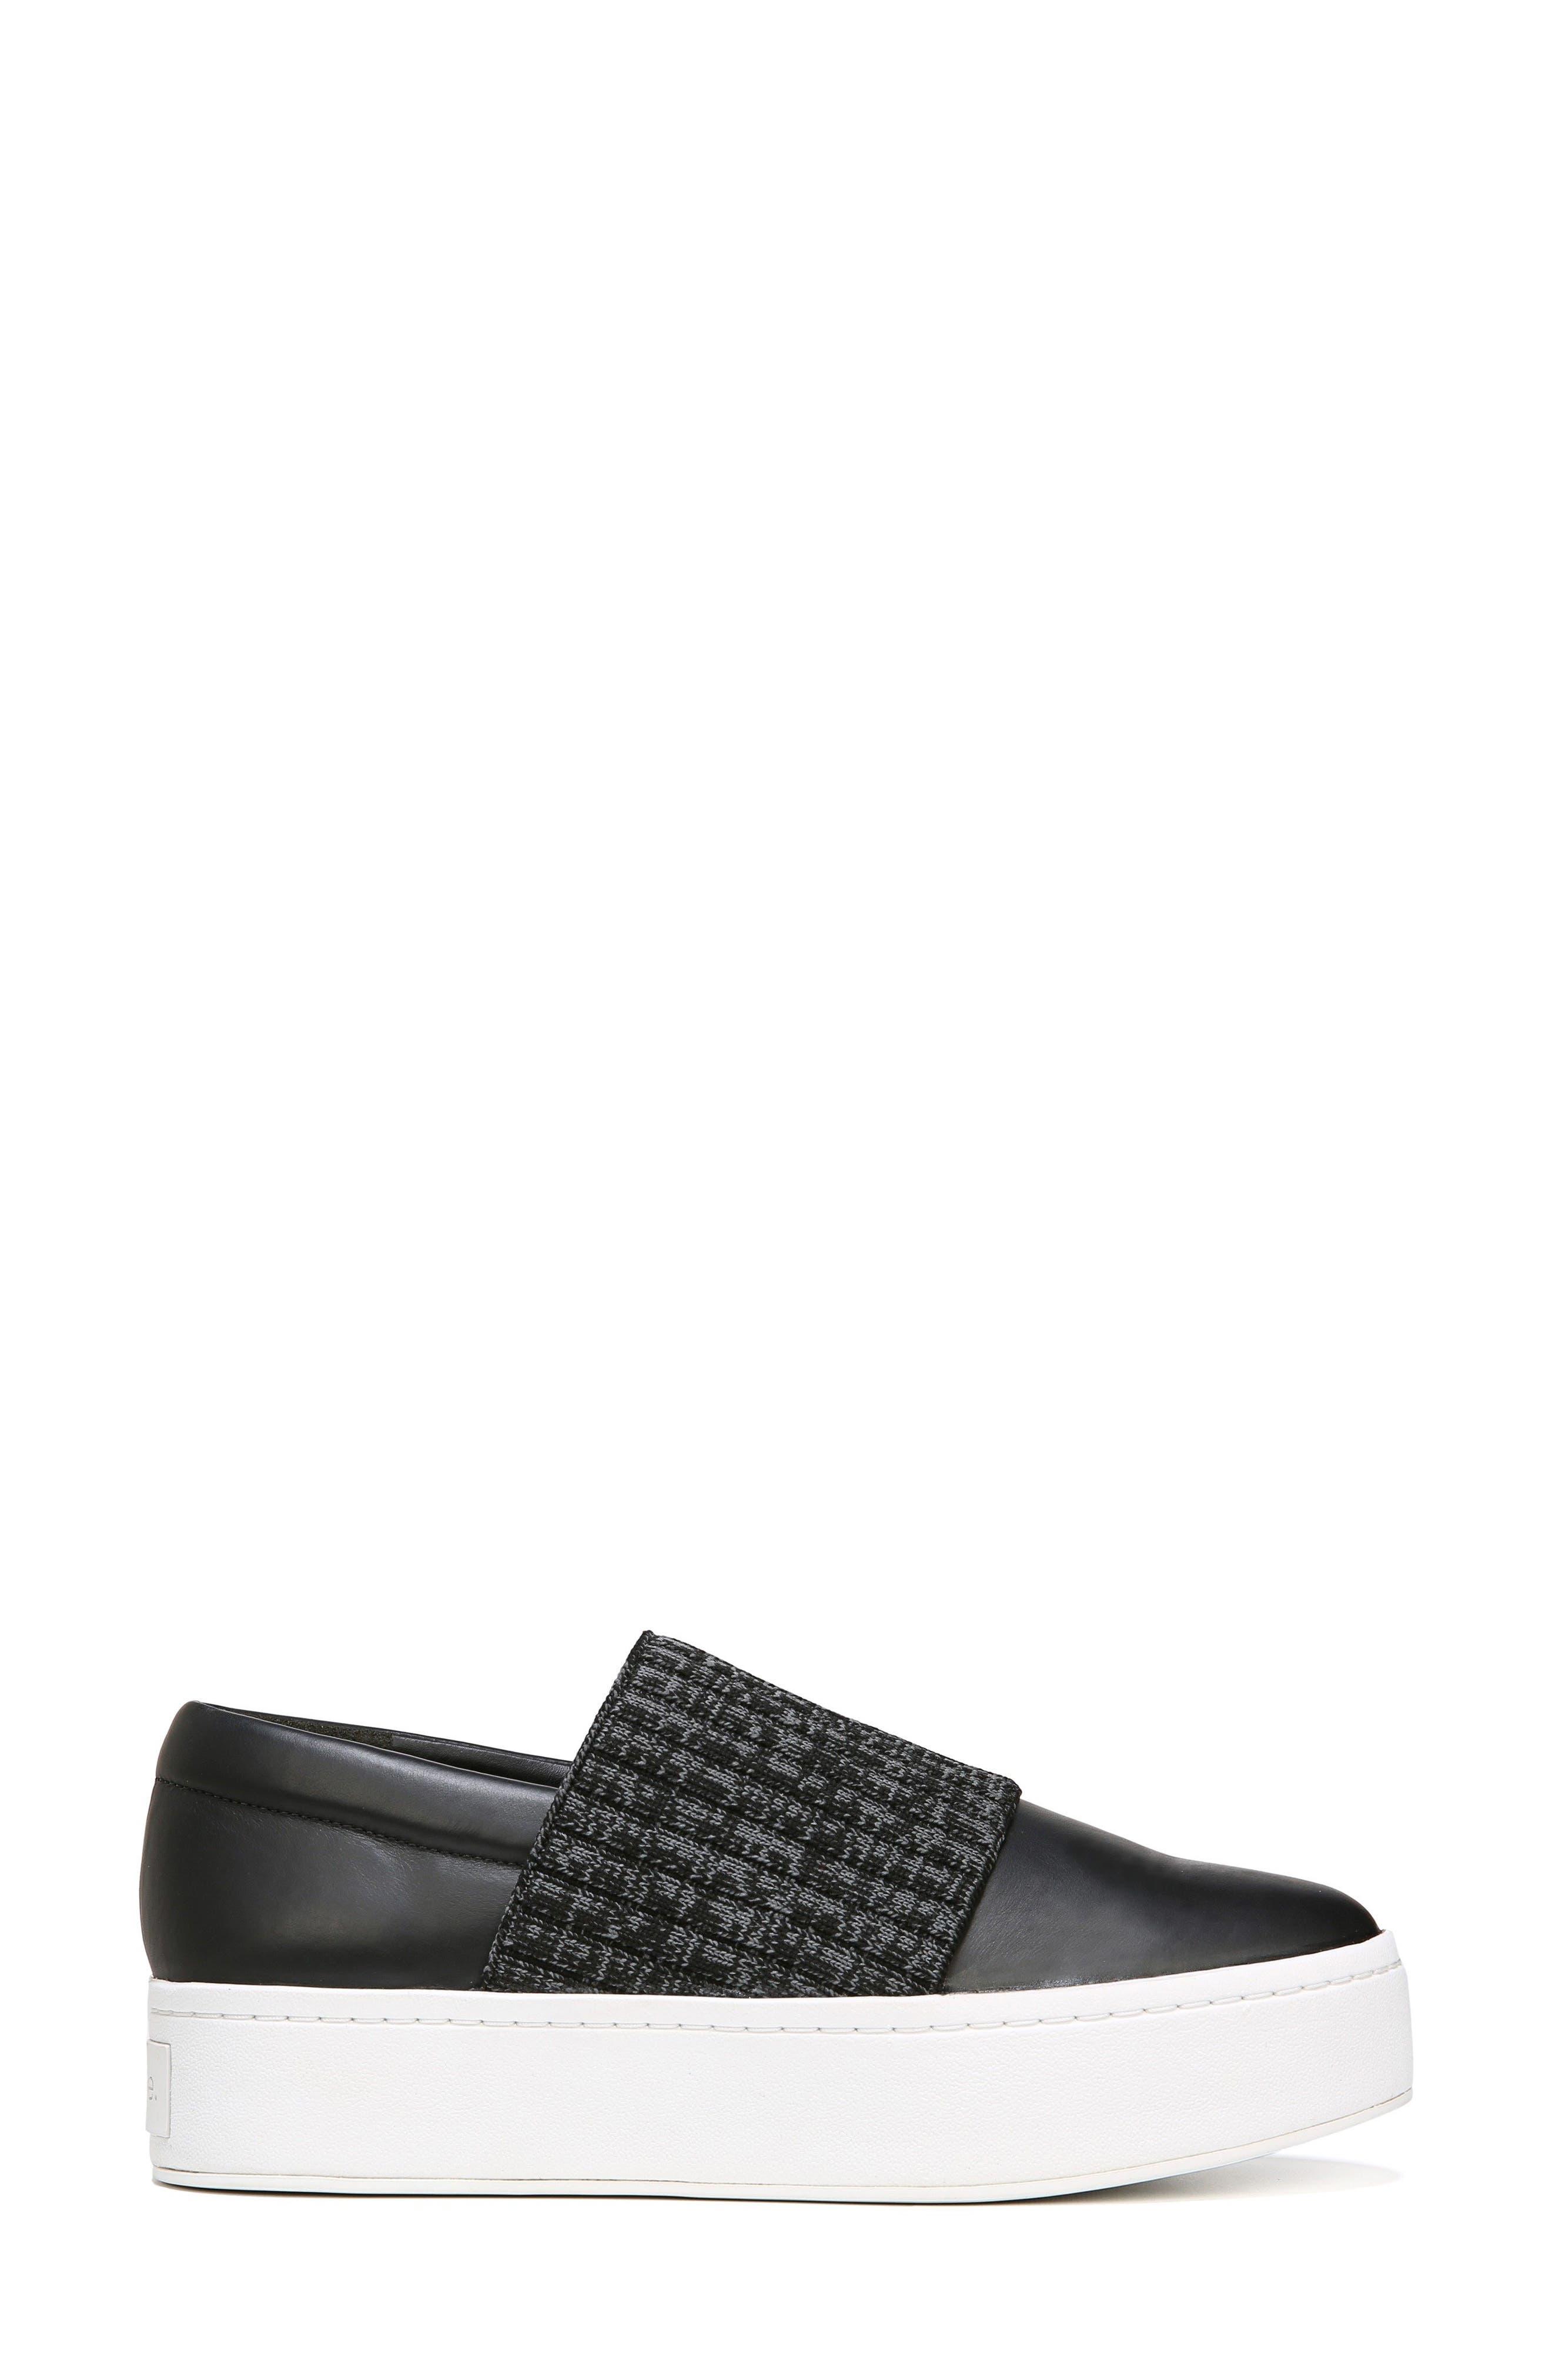 Weadon Slip-On Sneaker,                             Alternate thumbnail 3, color,                             Black Siviglia Calf